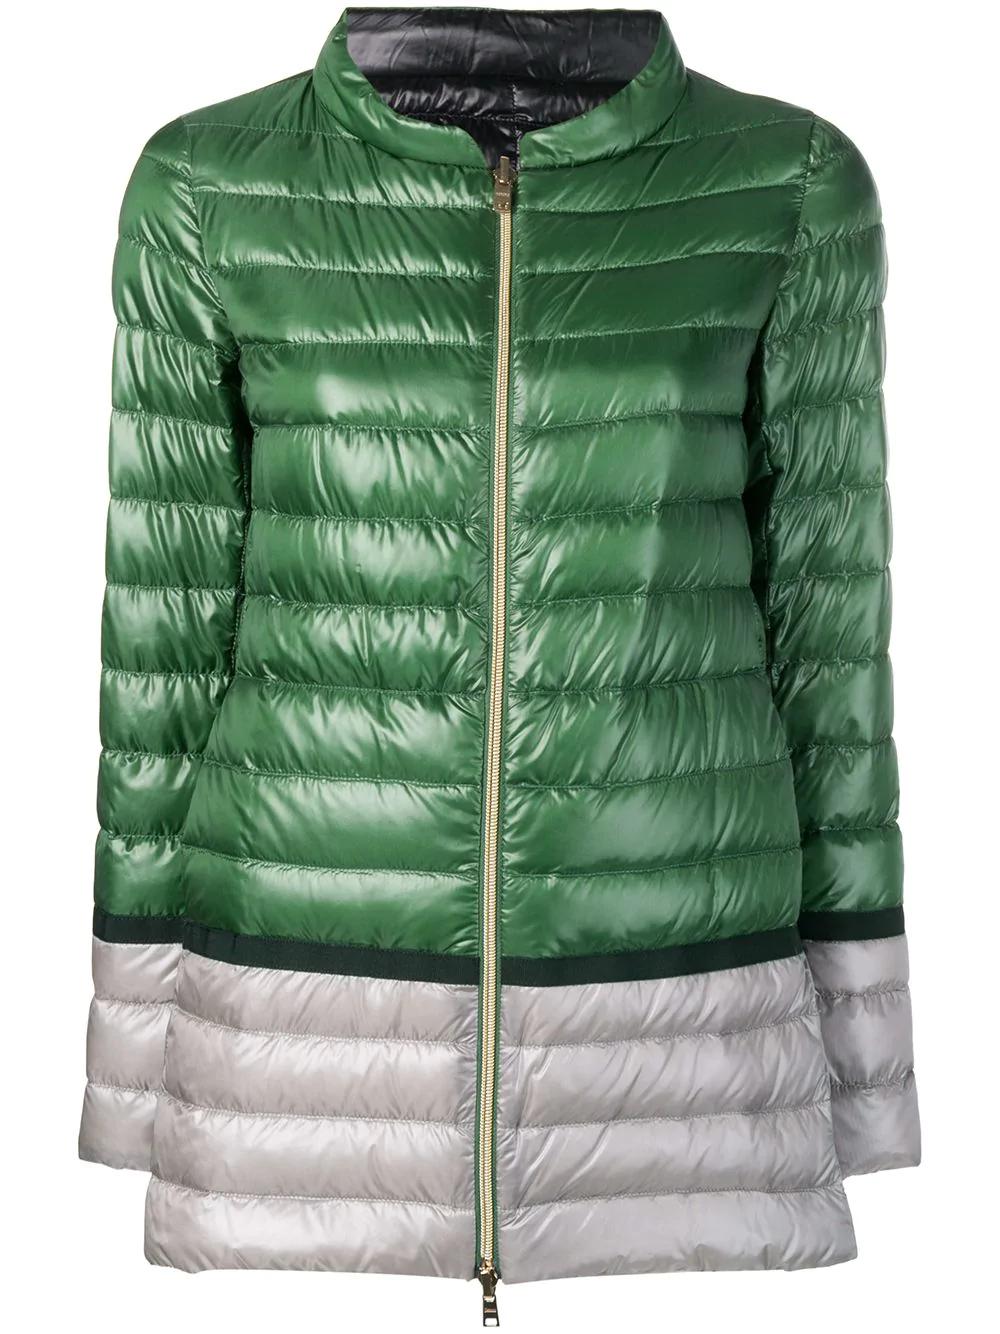 8ef8d575a6b8 Herno Colour-Block Puffer Jacket - Green